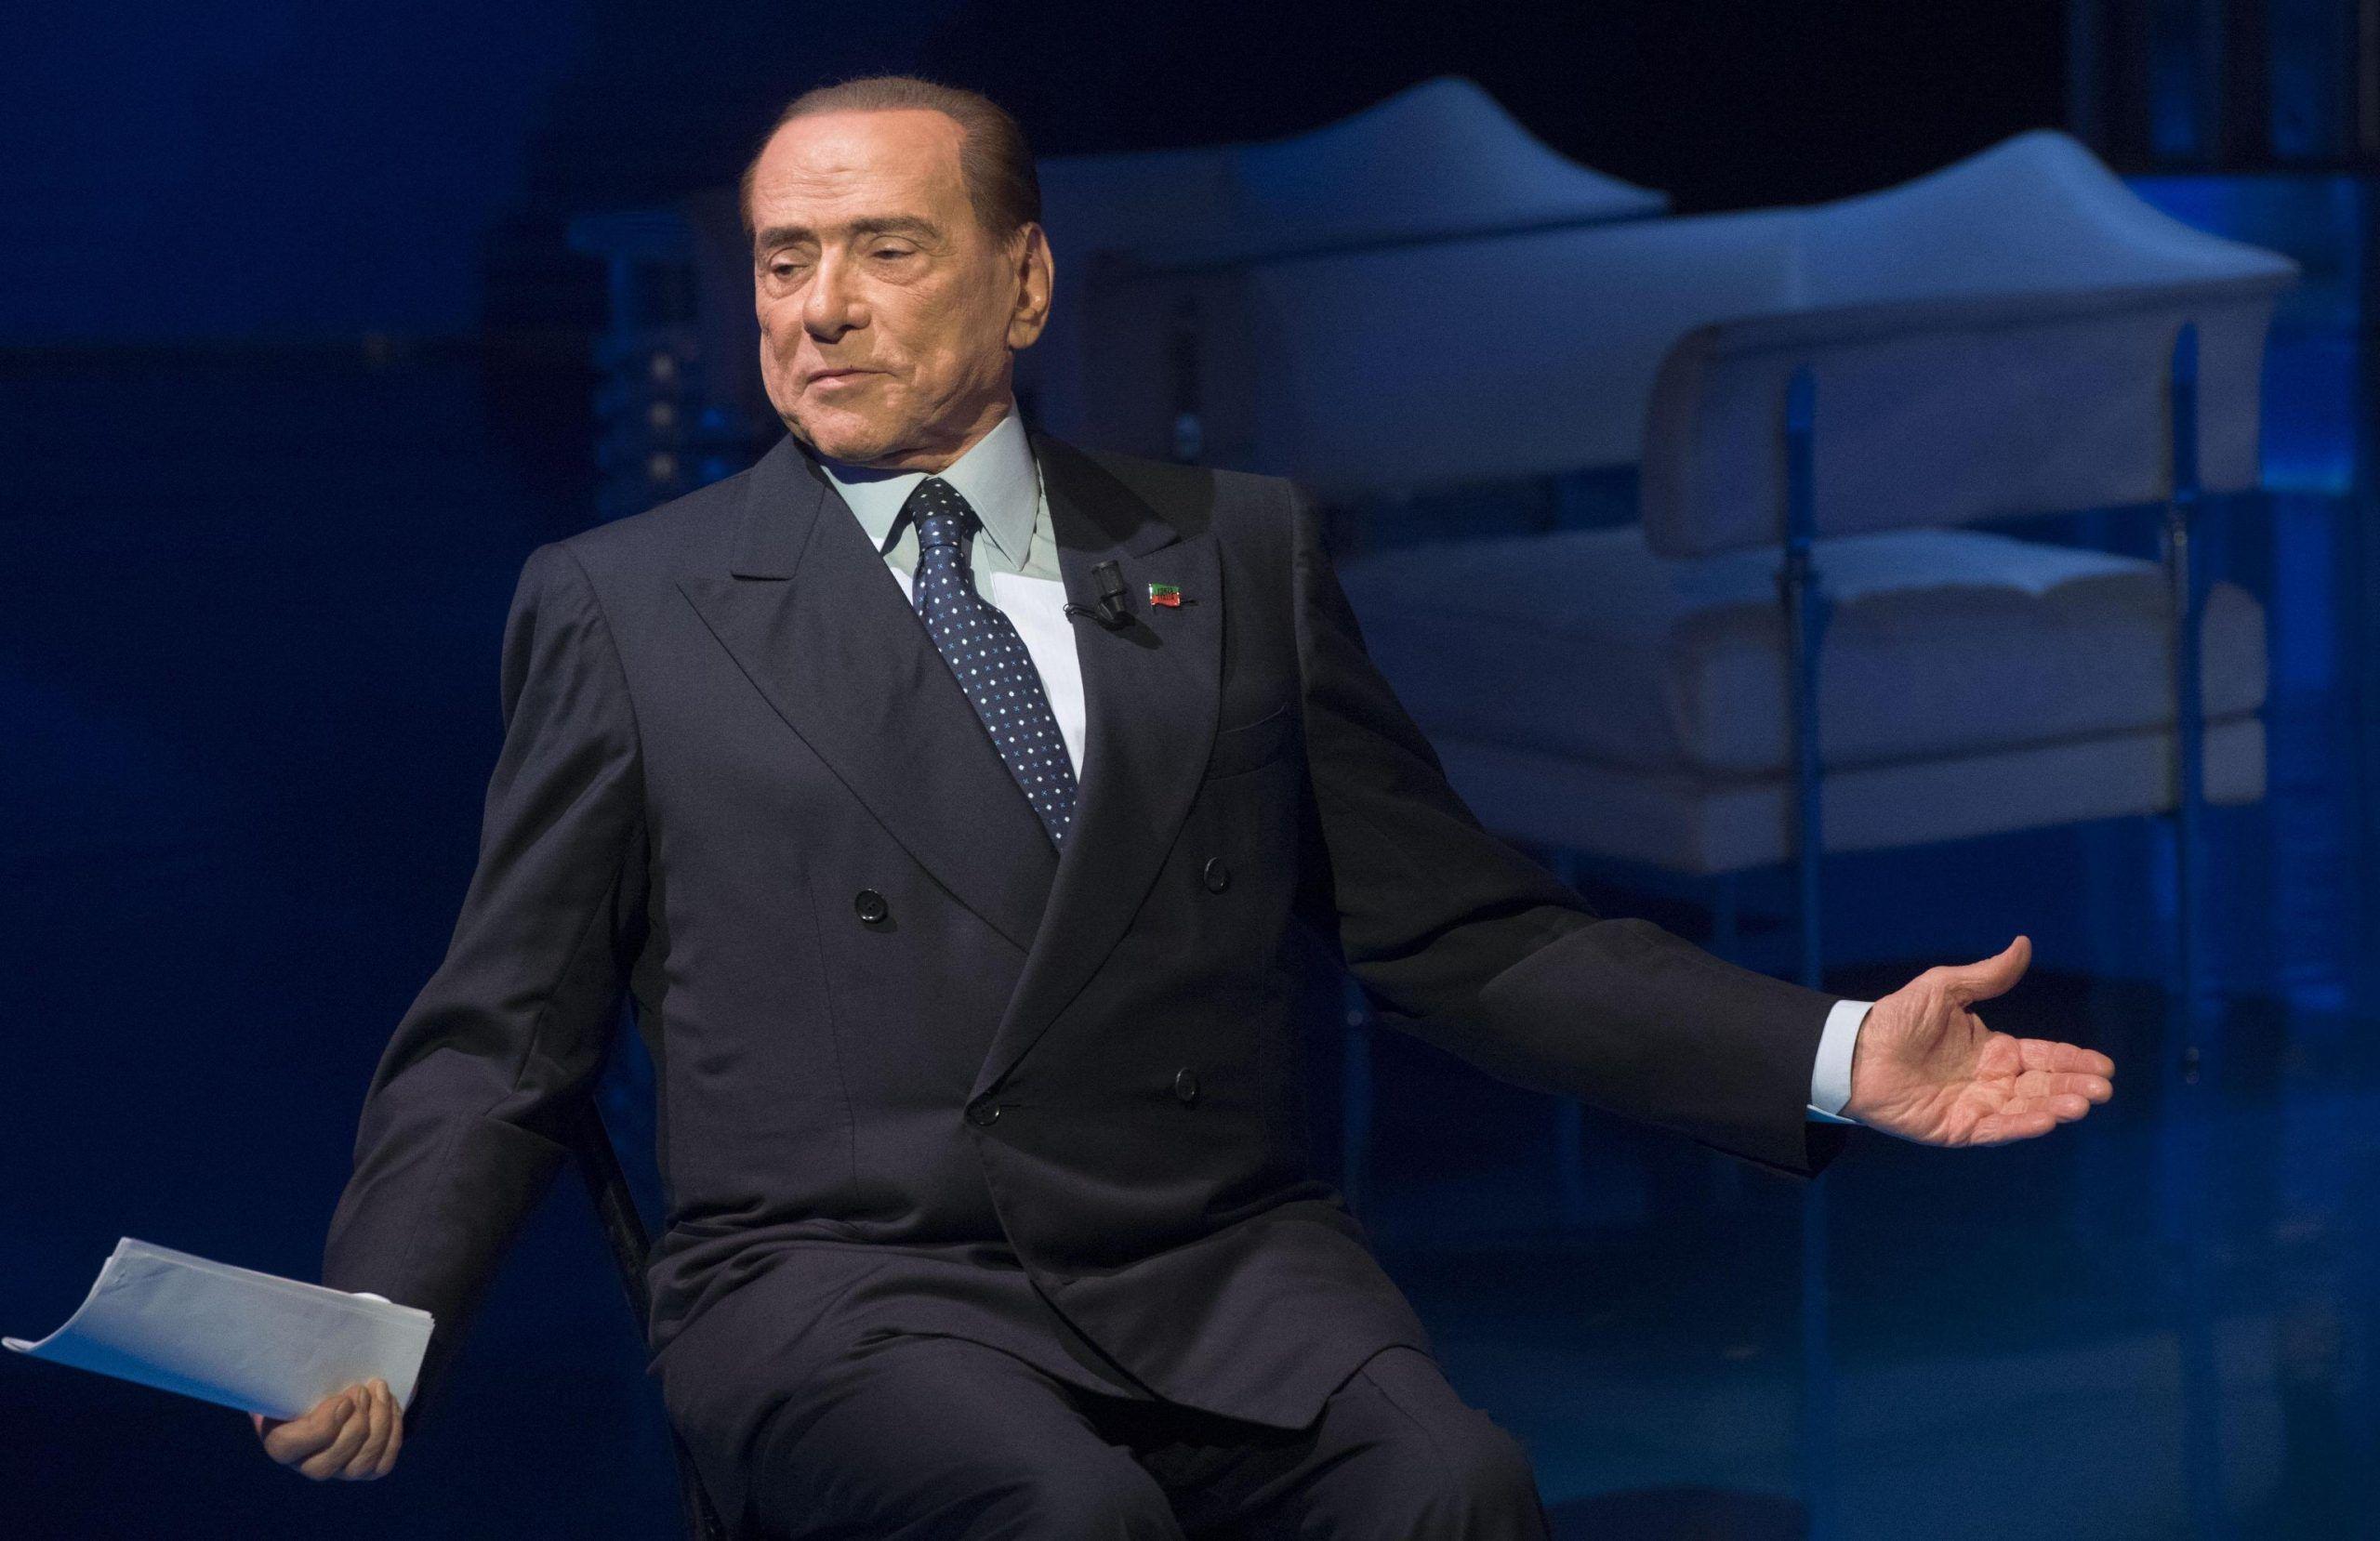 Silvio Berlusconi Rai TV program 'Porta a porta'